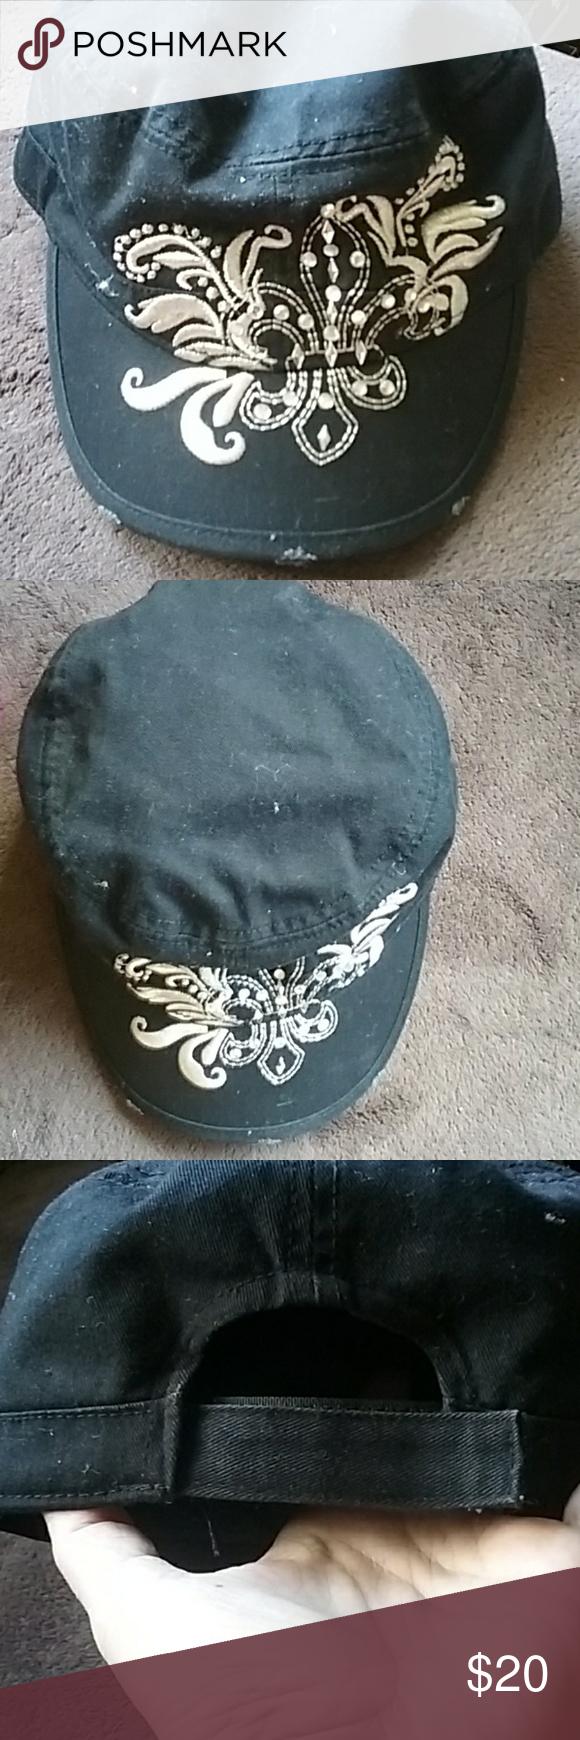 Brand New Fleur de Lis hat with rhinestones Brand new